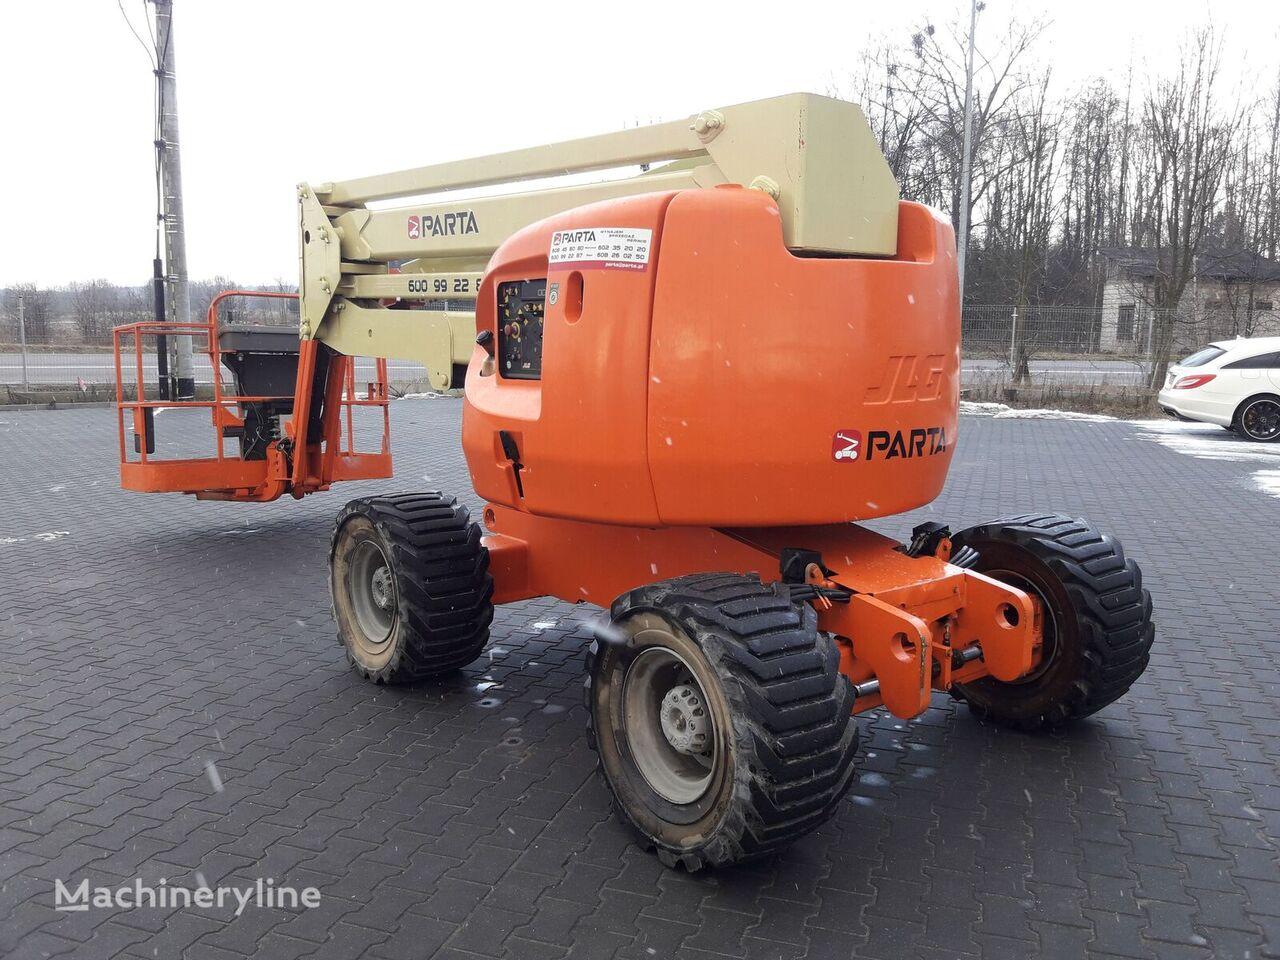 JLG 450AJ  articulated boom lift